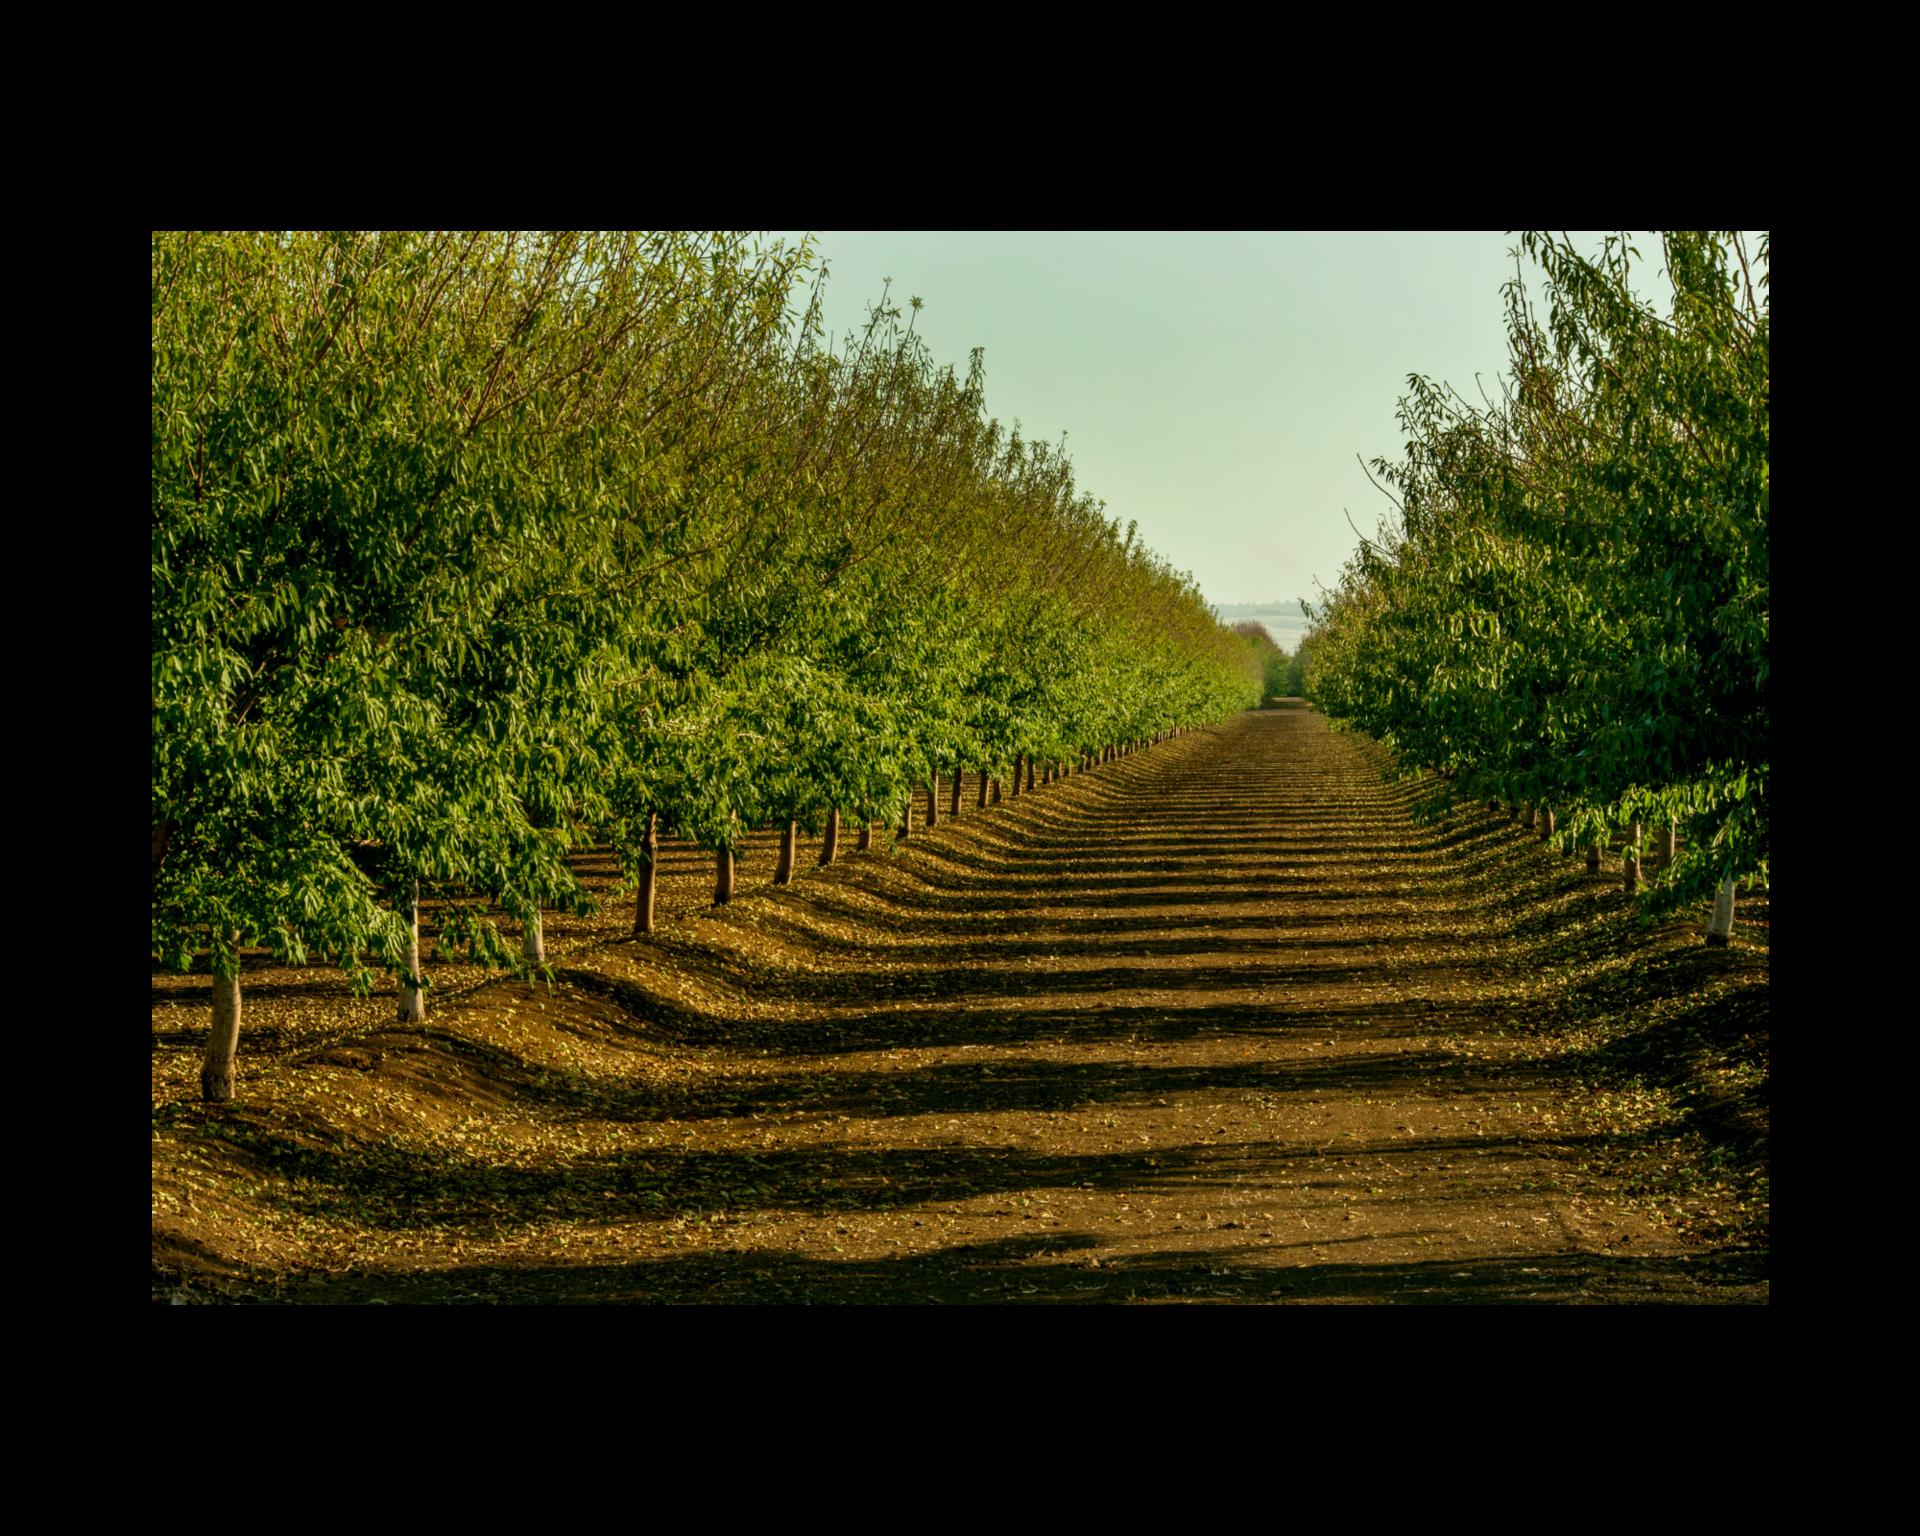 Almond tree crop row